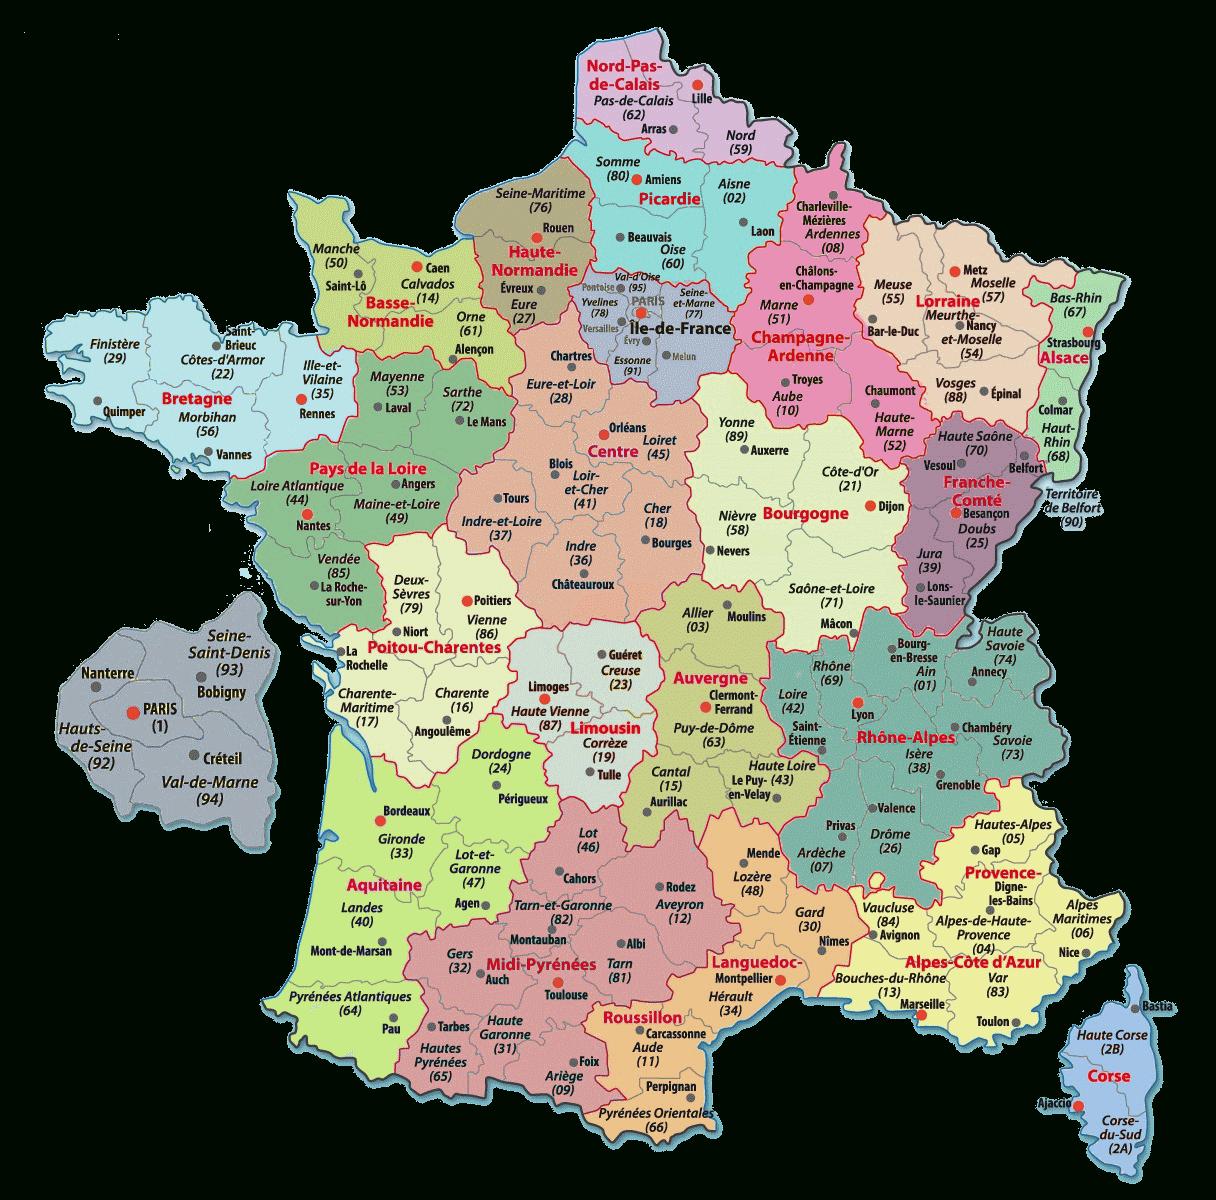 La Carte France Departement - PrimaNYC.com